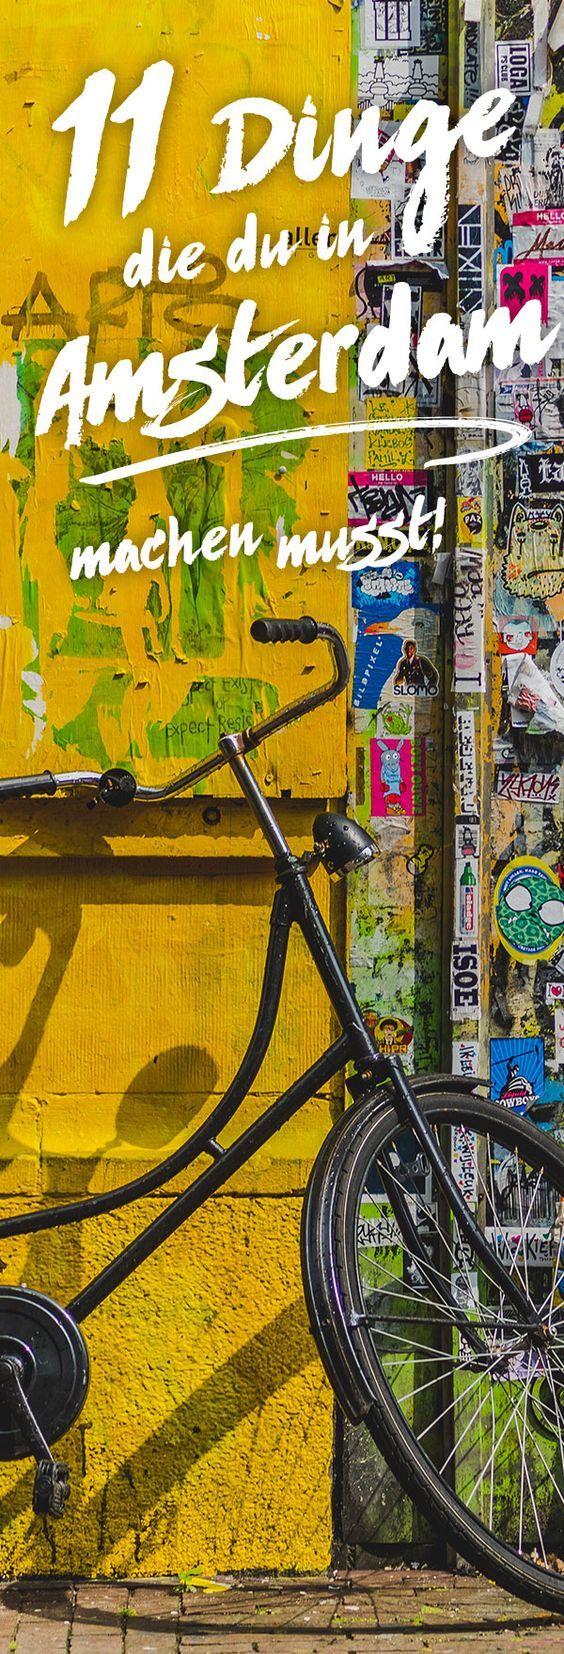 11 Dinge, die du in Amsterdam machen musst – Andreas Lackner